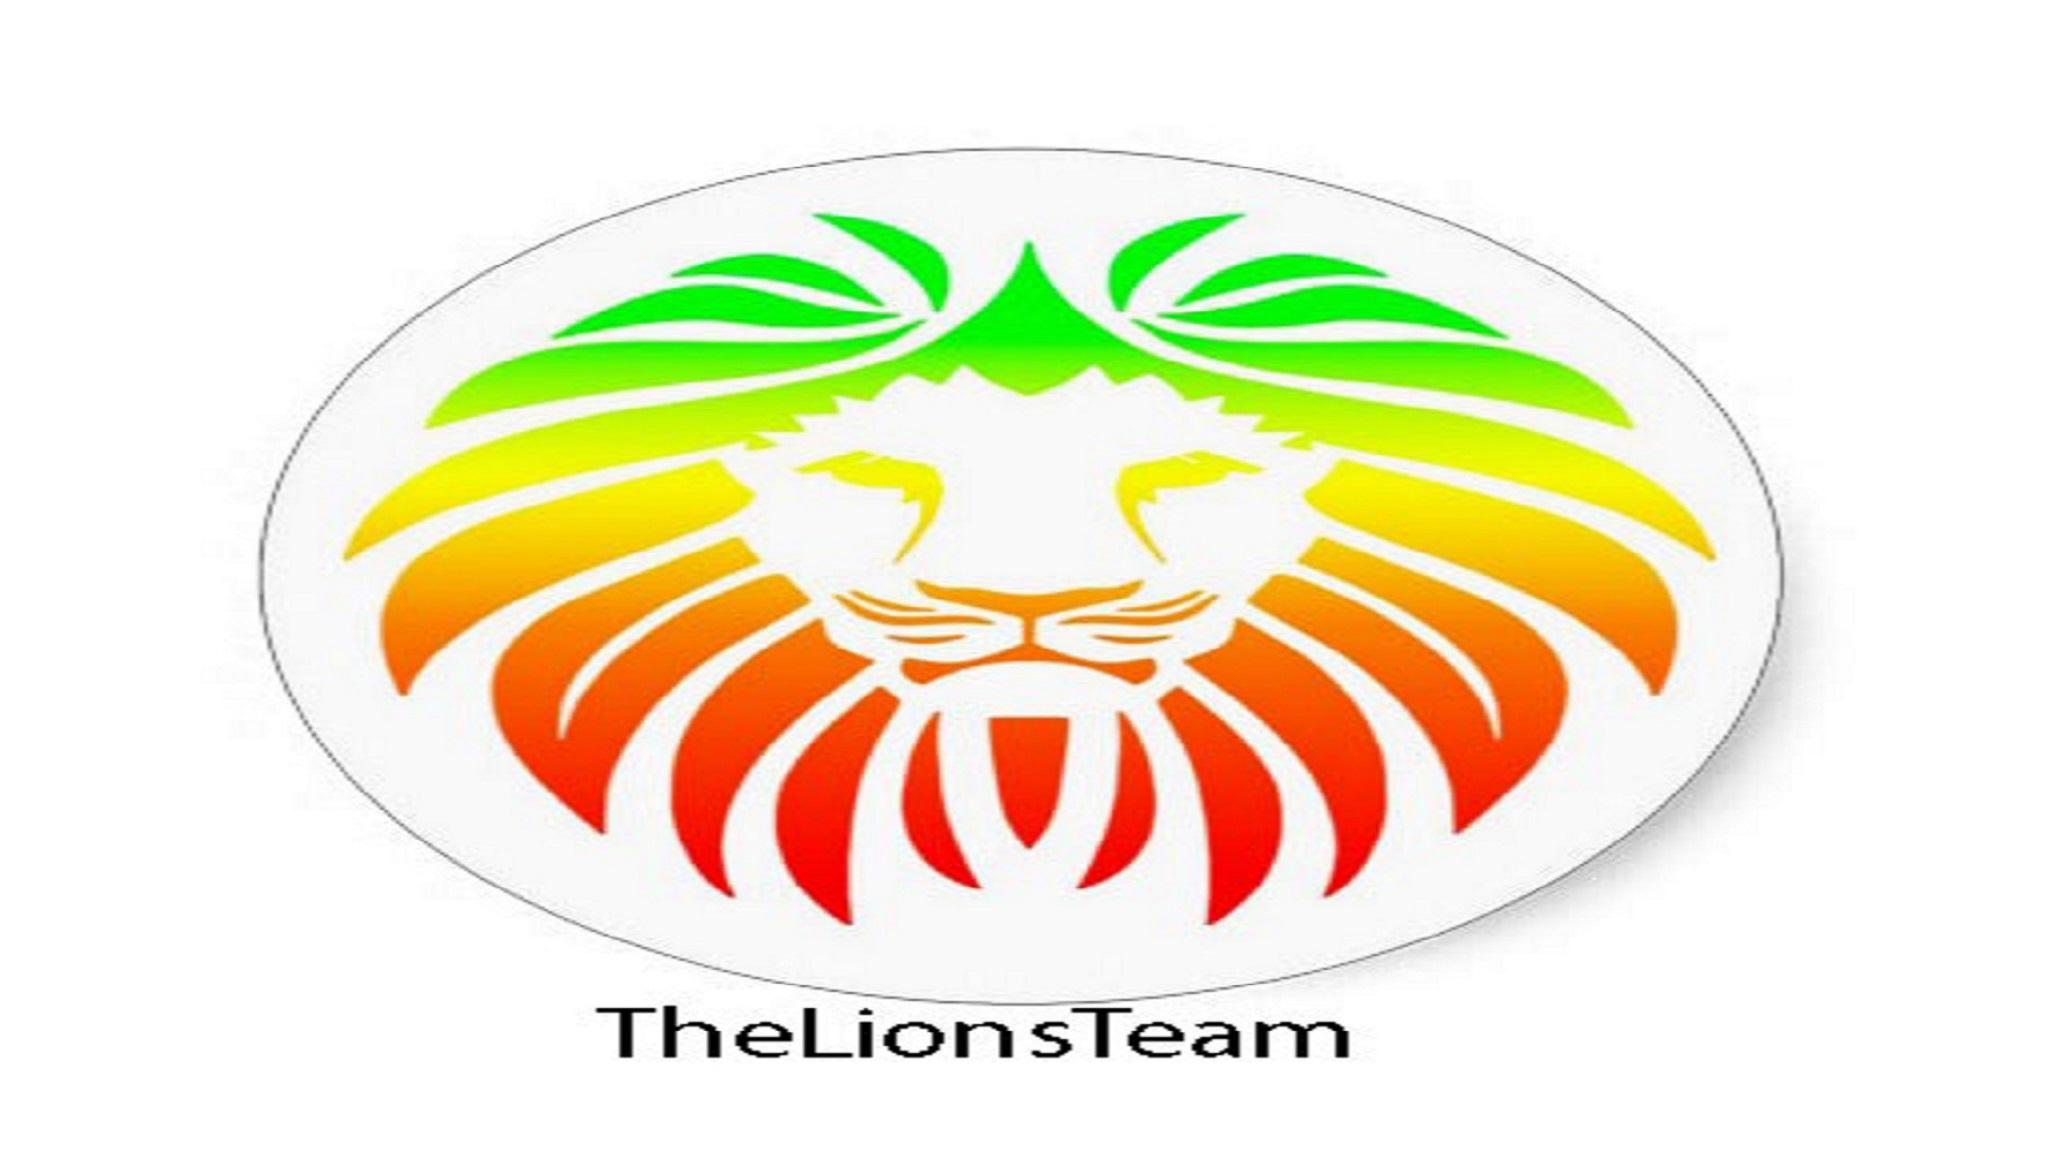 Artwork Logo's & Design